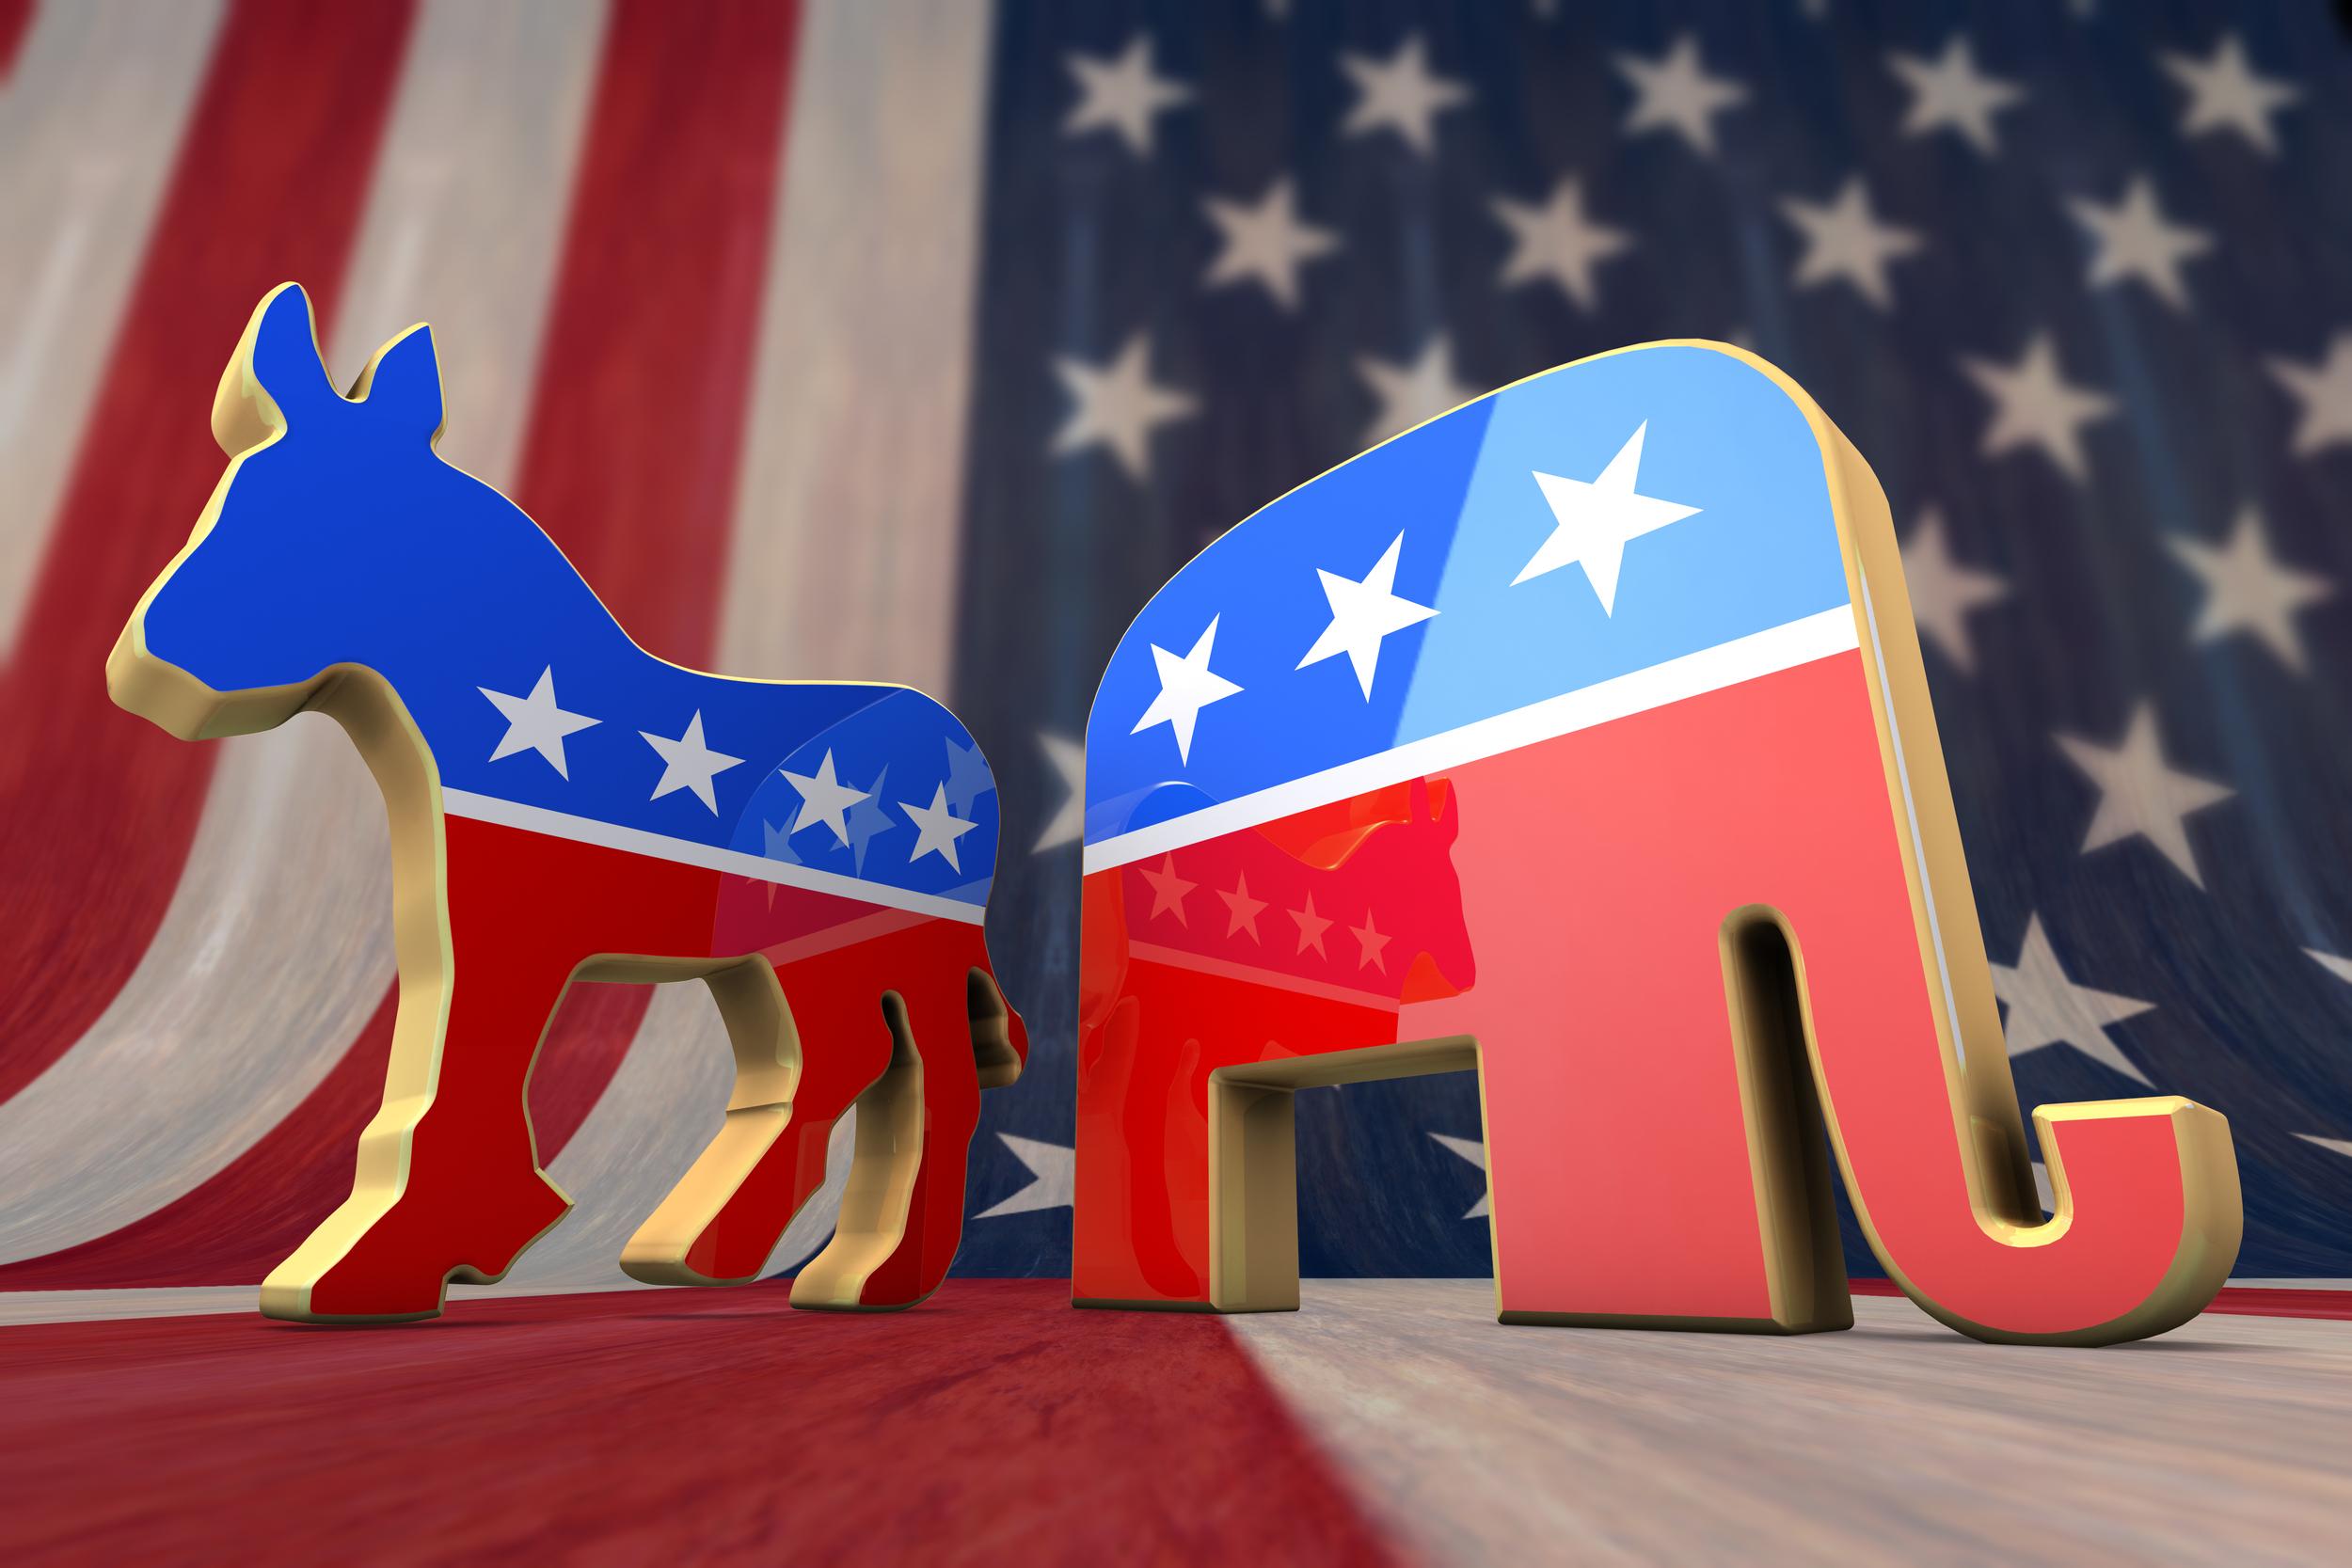 republican-democrat-donkey-elephant1.jpg